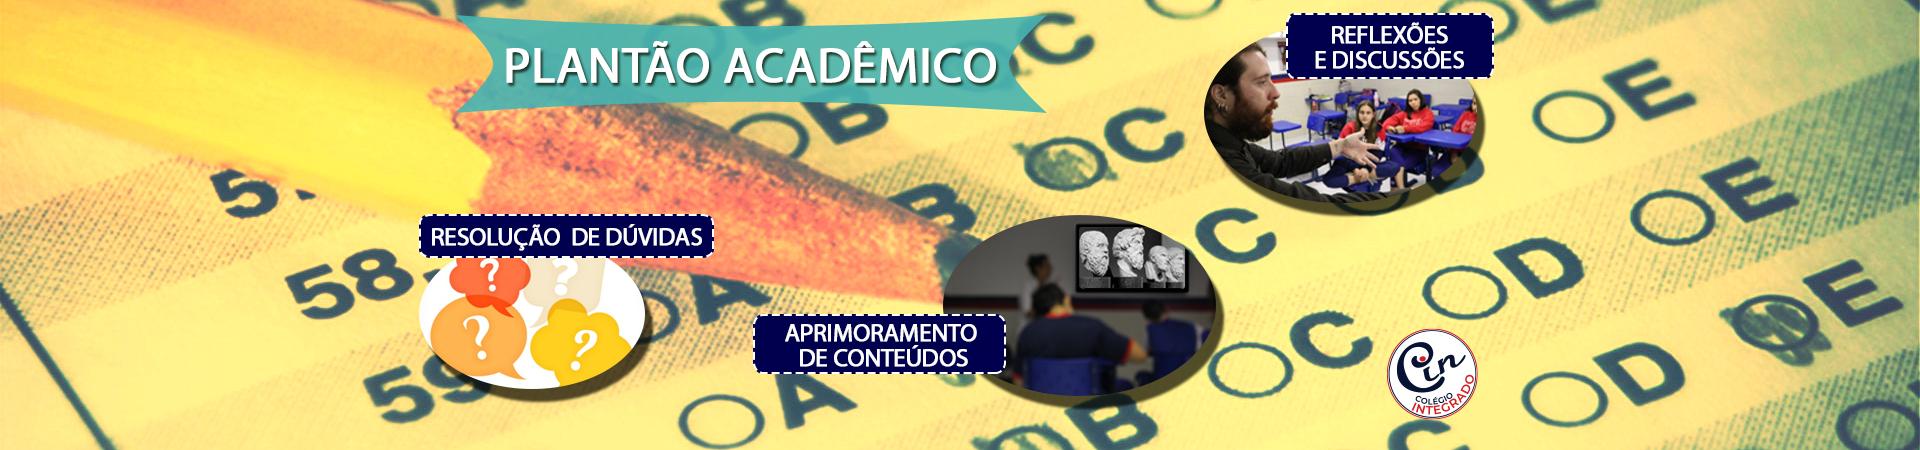 slide-plantao-academico